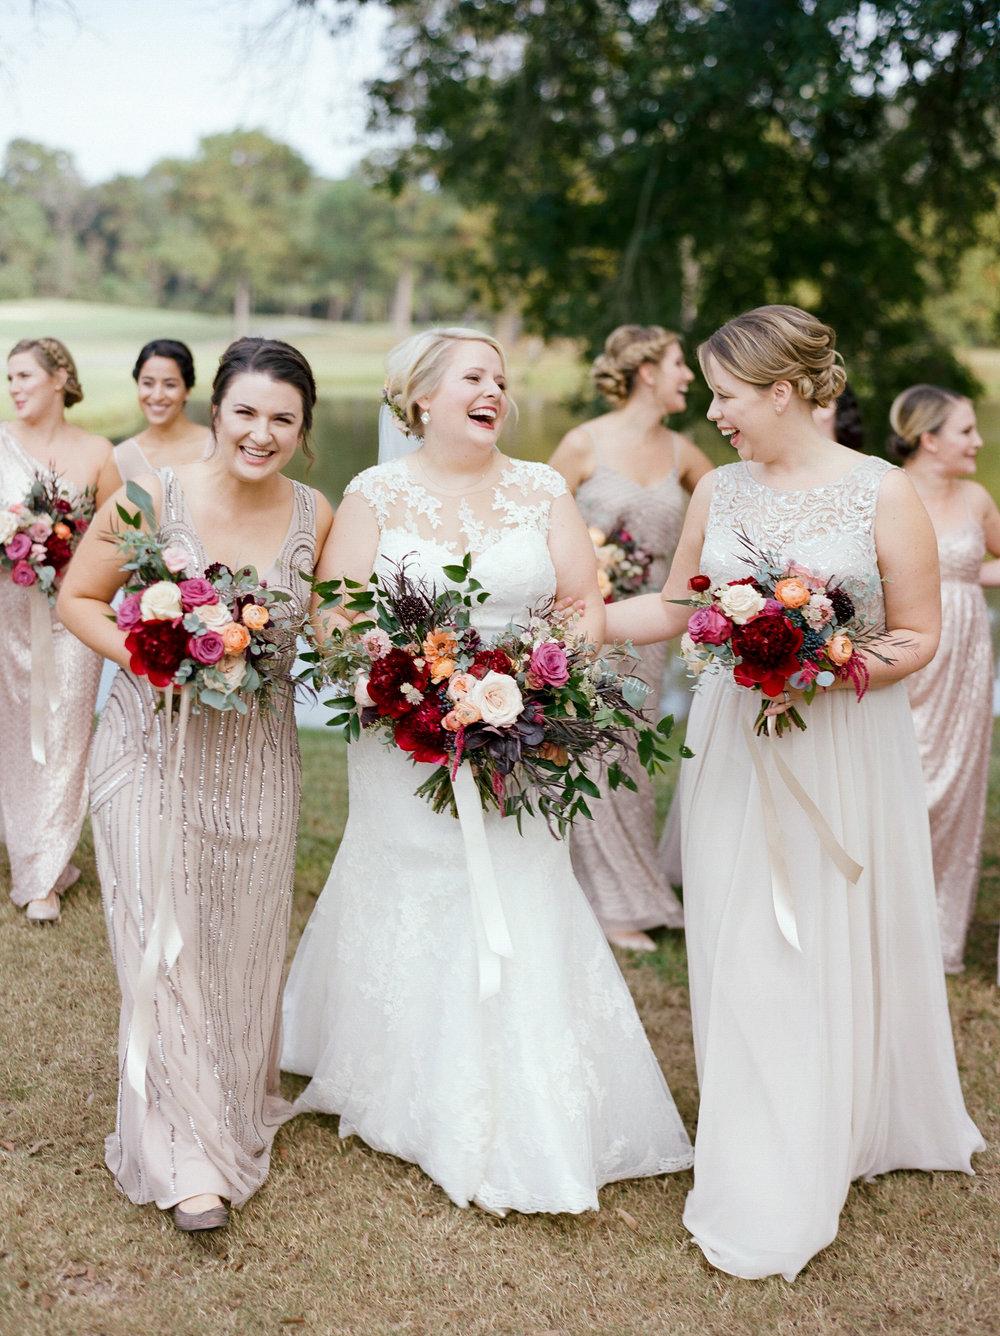 Houston-Wedding-Photographer-Fine-Art-Film-Destination-Style-Me-Pretty-Austin-Dallas-New-Orleans-Dana-Fernandez-Photography-The Woodlands-Country-Club-6.jpg